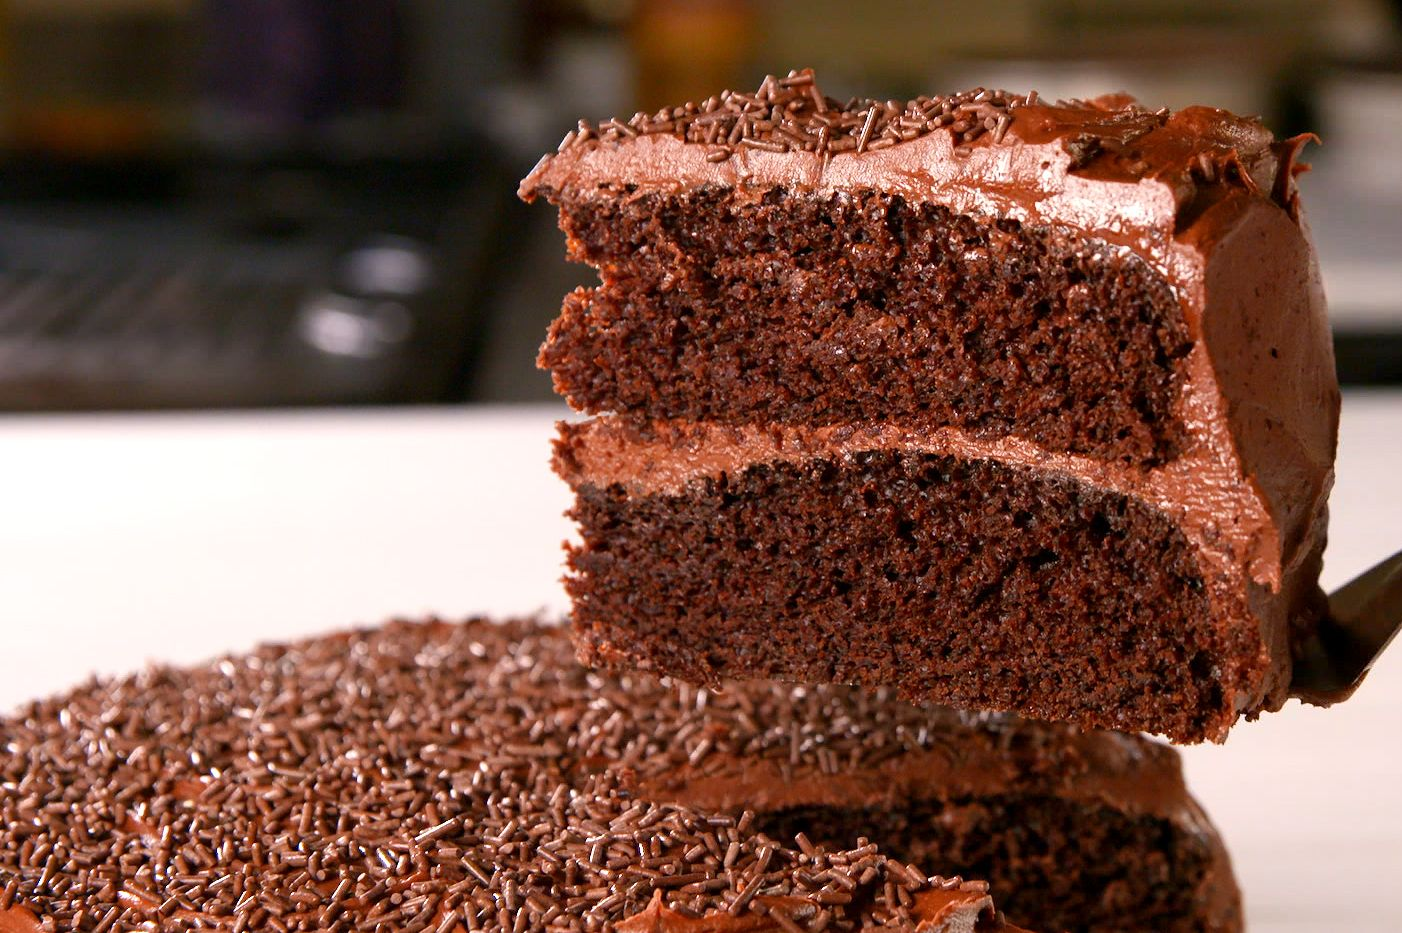 Martha Stewart Vs Snoop Dogg Whose Chocolate Cake Is Better